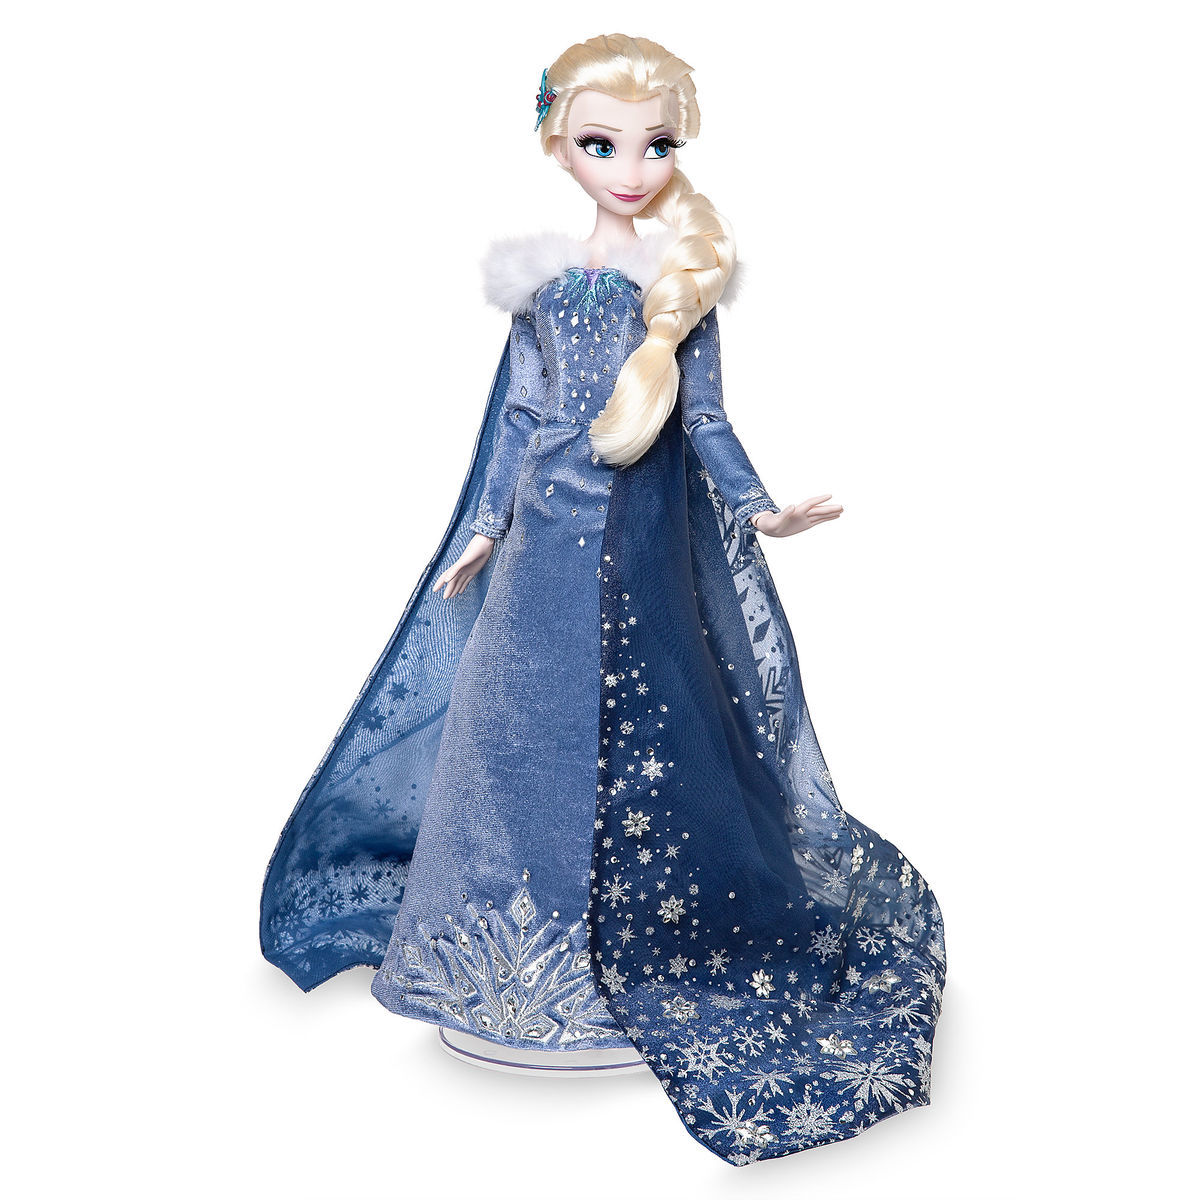 Elsa Doll - Olaf\'s Frozen Adventure - Limited Edition | shopDisney